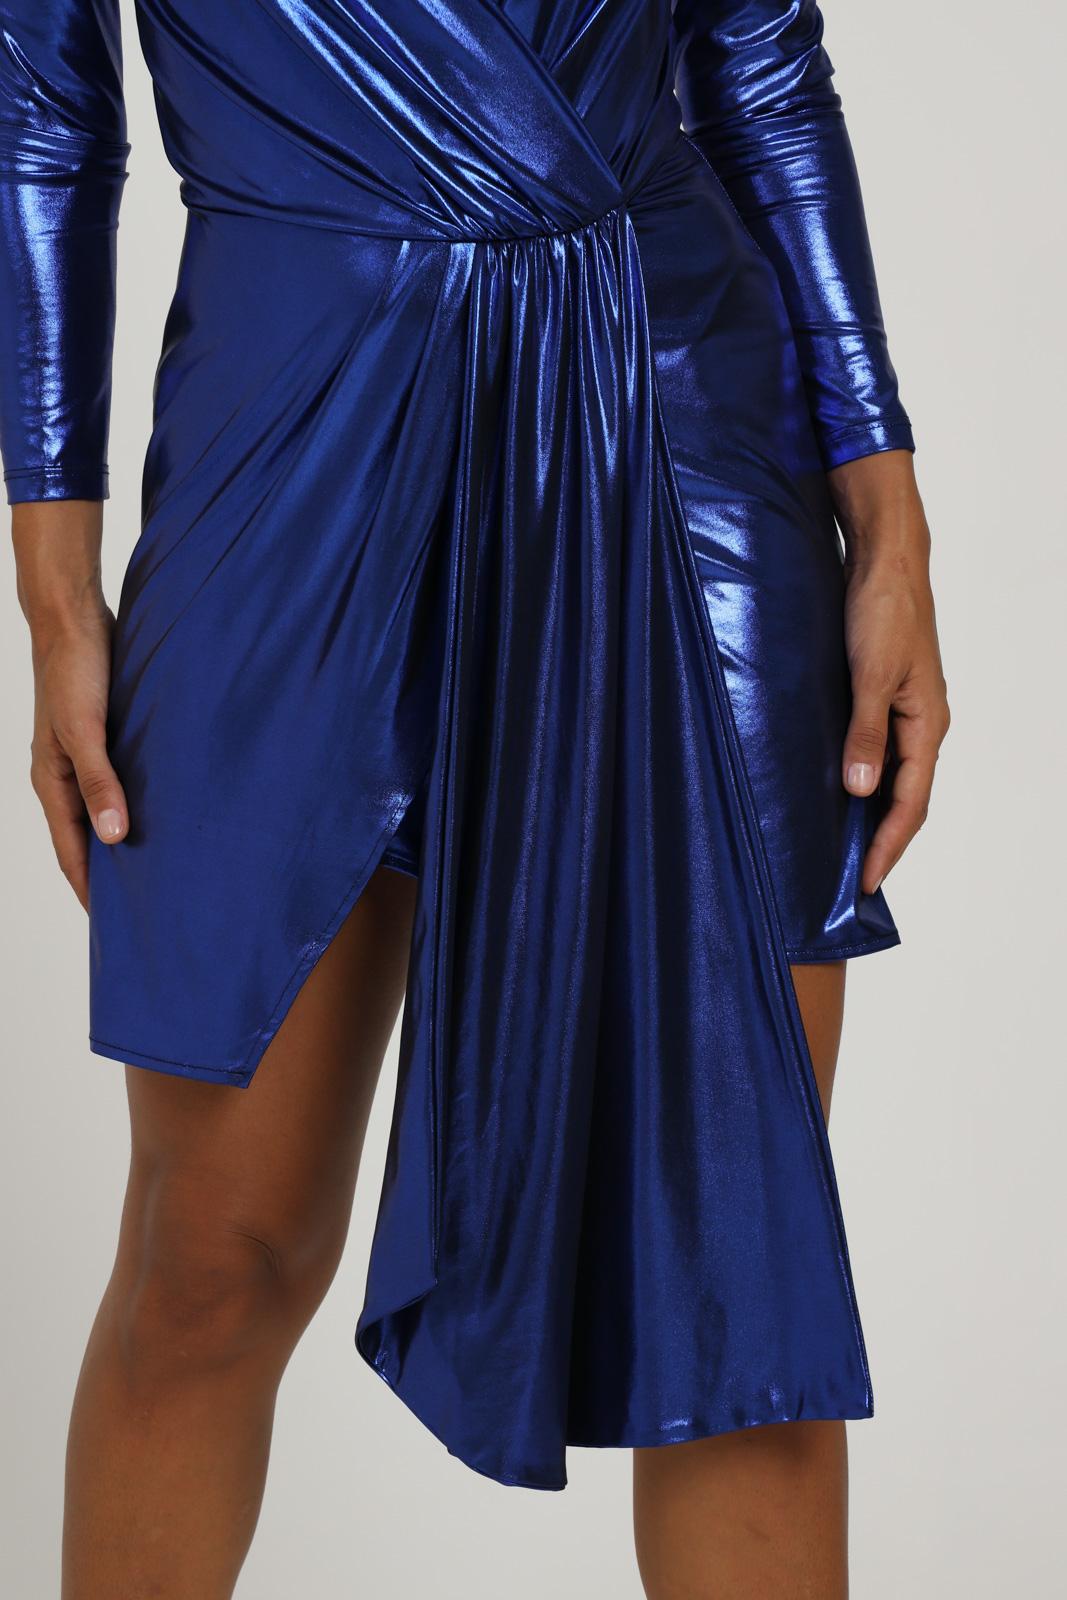 FEMINISTA | Dress | LUANDABLU ELETTRICO